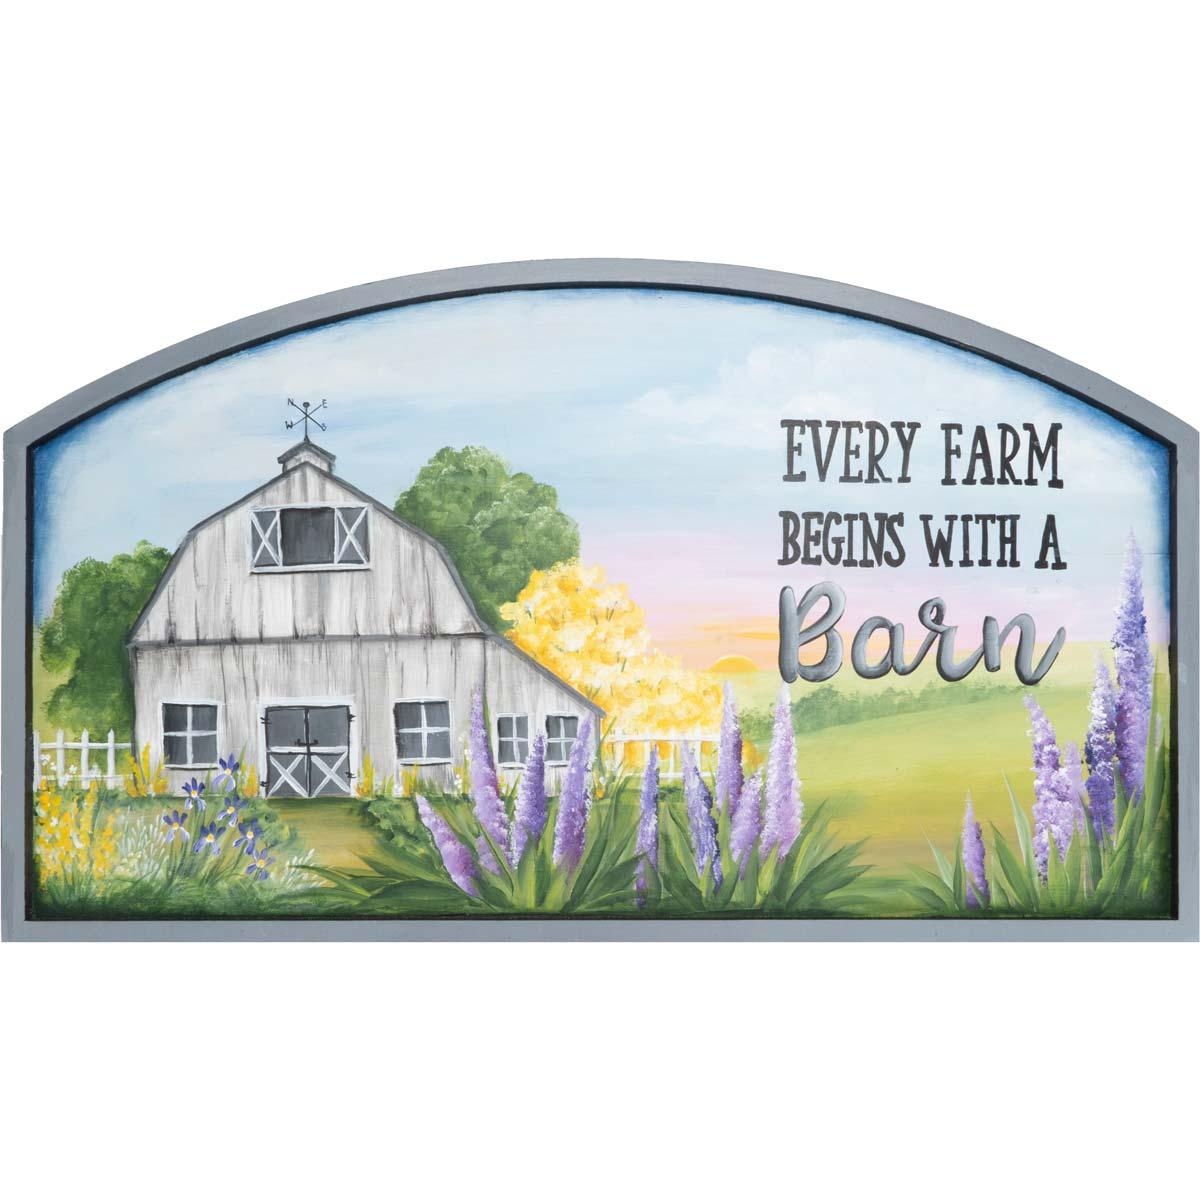 Every Farm Begins with a Barn